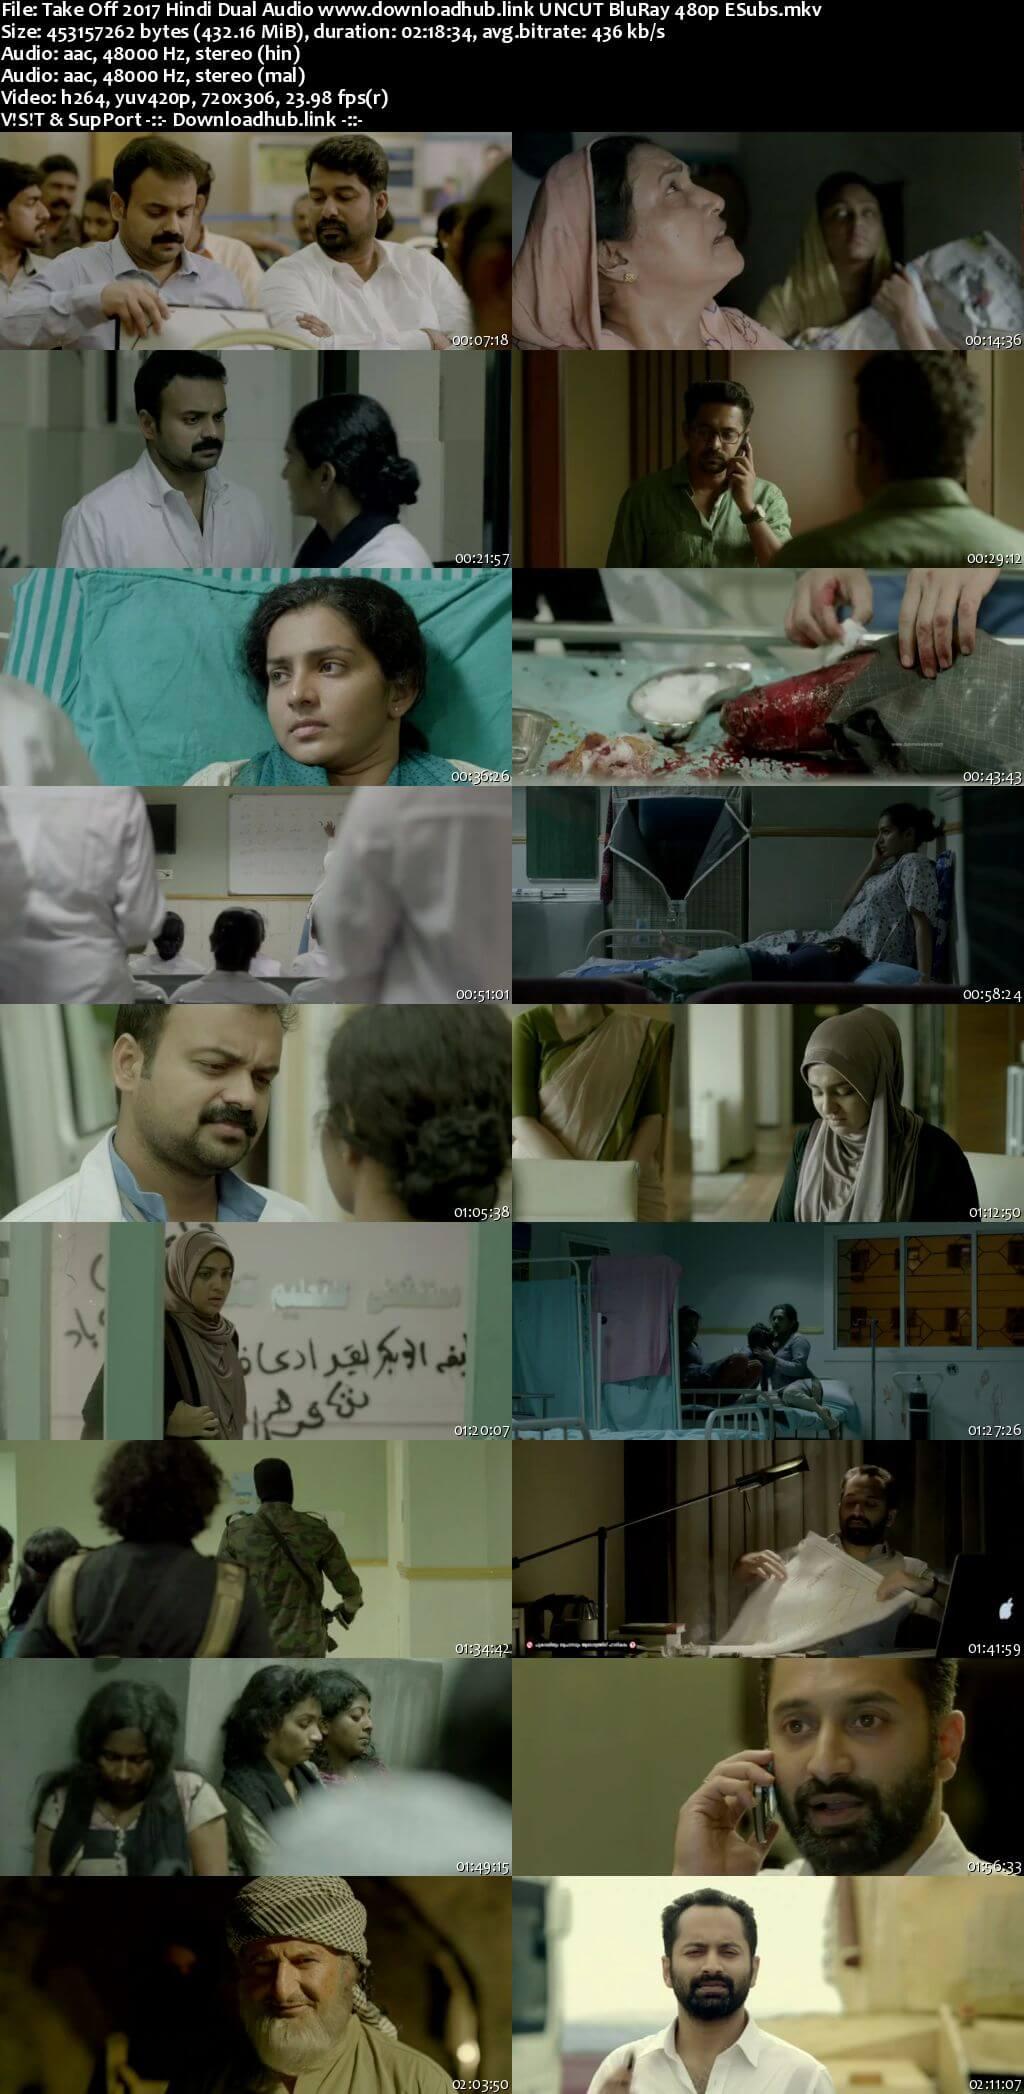 Take Off 2017 Hindi Dual Audio 400MB UNCUT BluRay 480p ESubs